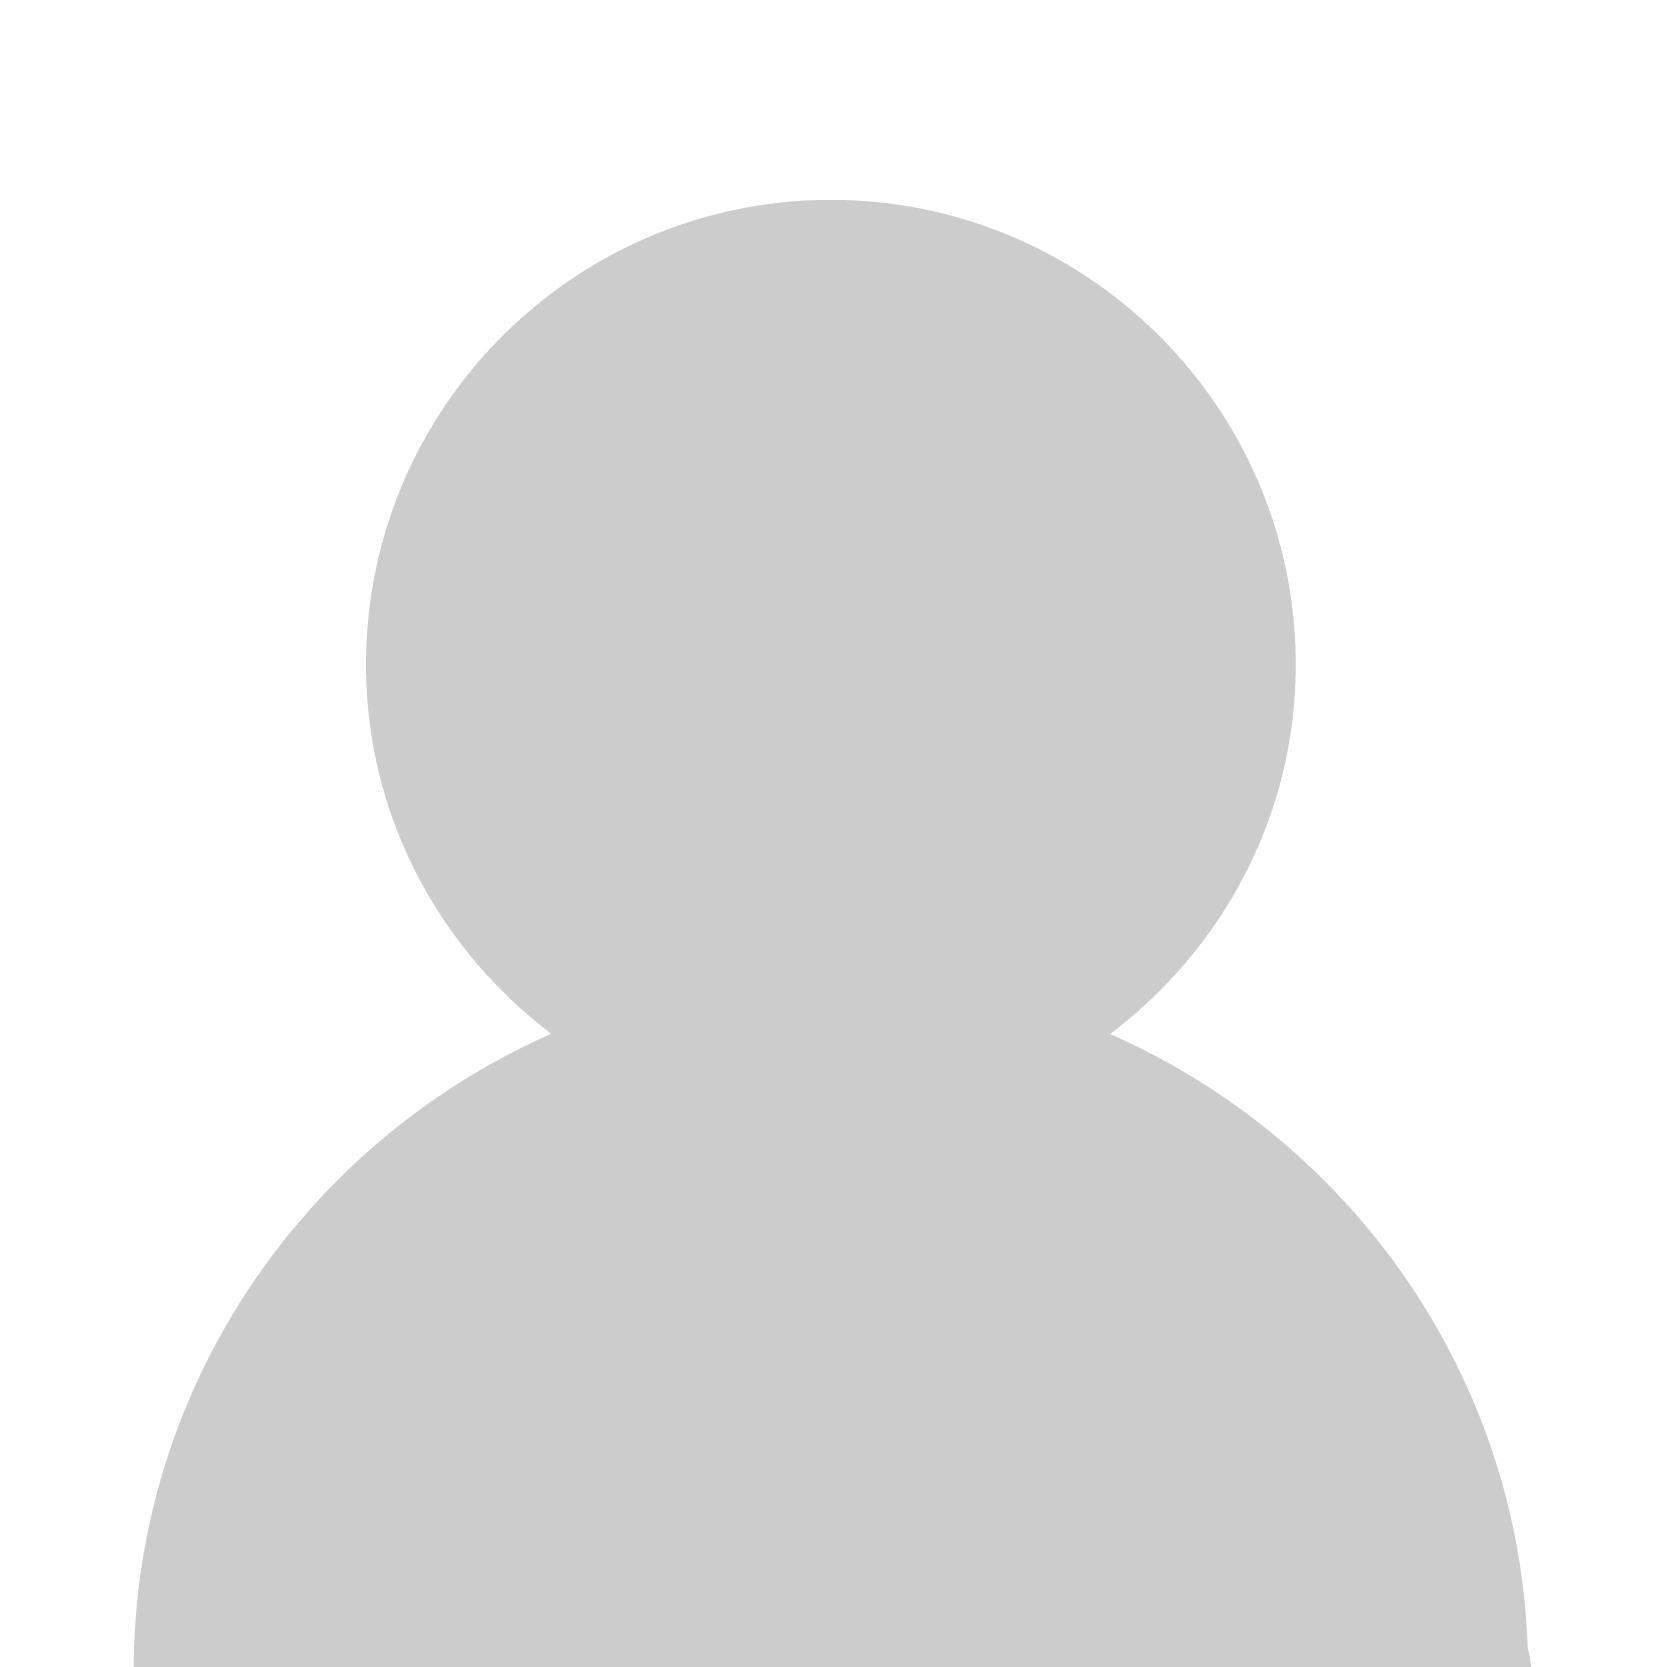 Картинка без аватарки